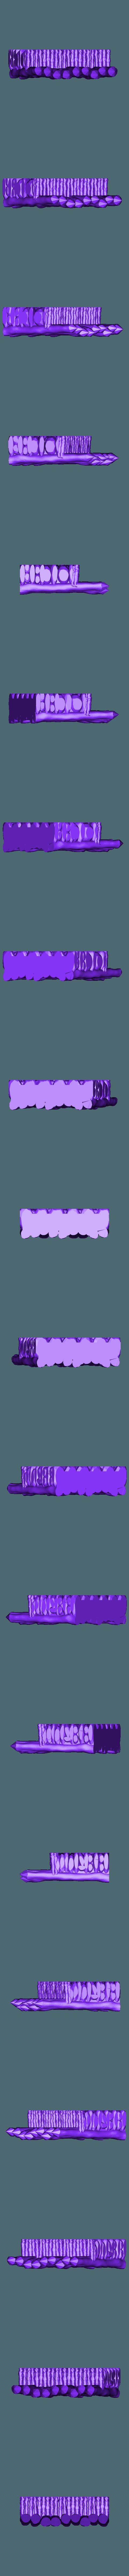 GoblinWallA.stl Download free STL file Kyn Finvara: Goblin Fort Wall (Heroic scale) • Model to 3D print, Dutchmogul